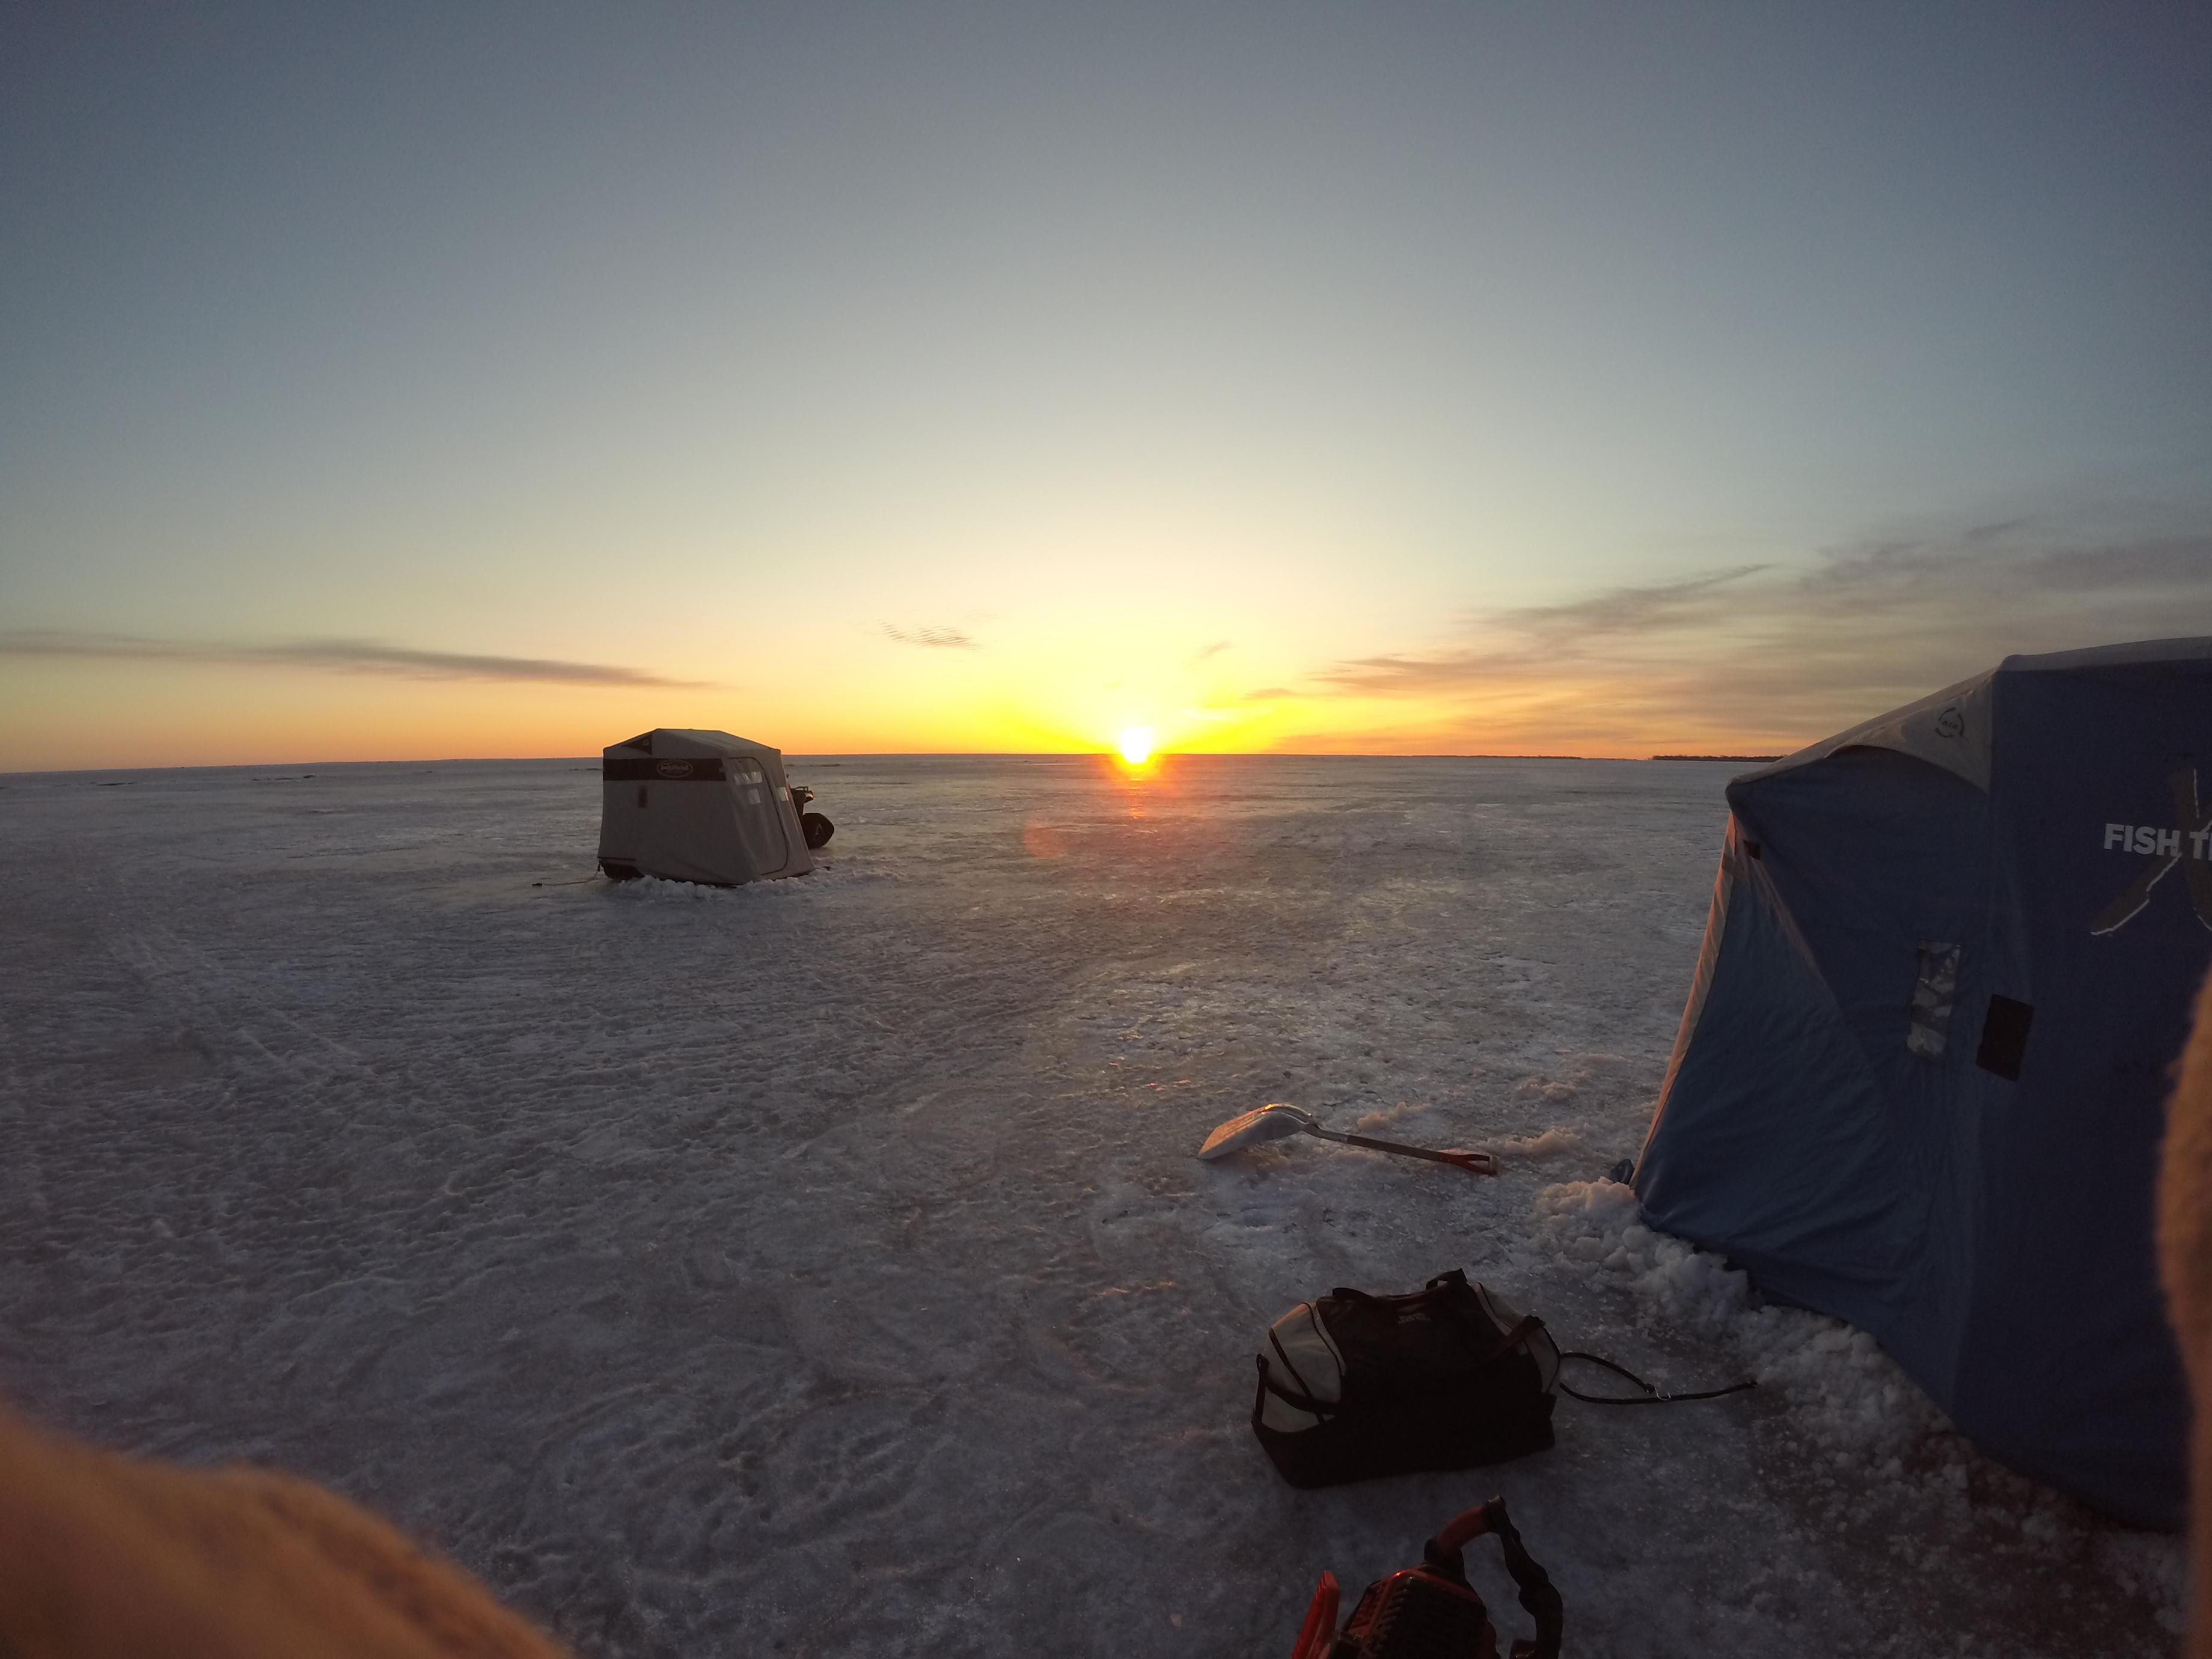 Photo 25 of 25 ice fishing on lake winnipeg in march for Lake winnipeg ice fishing